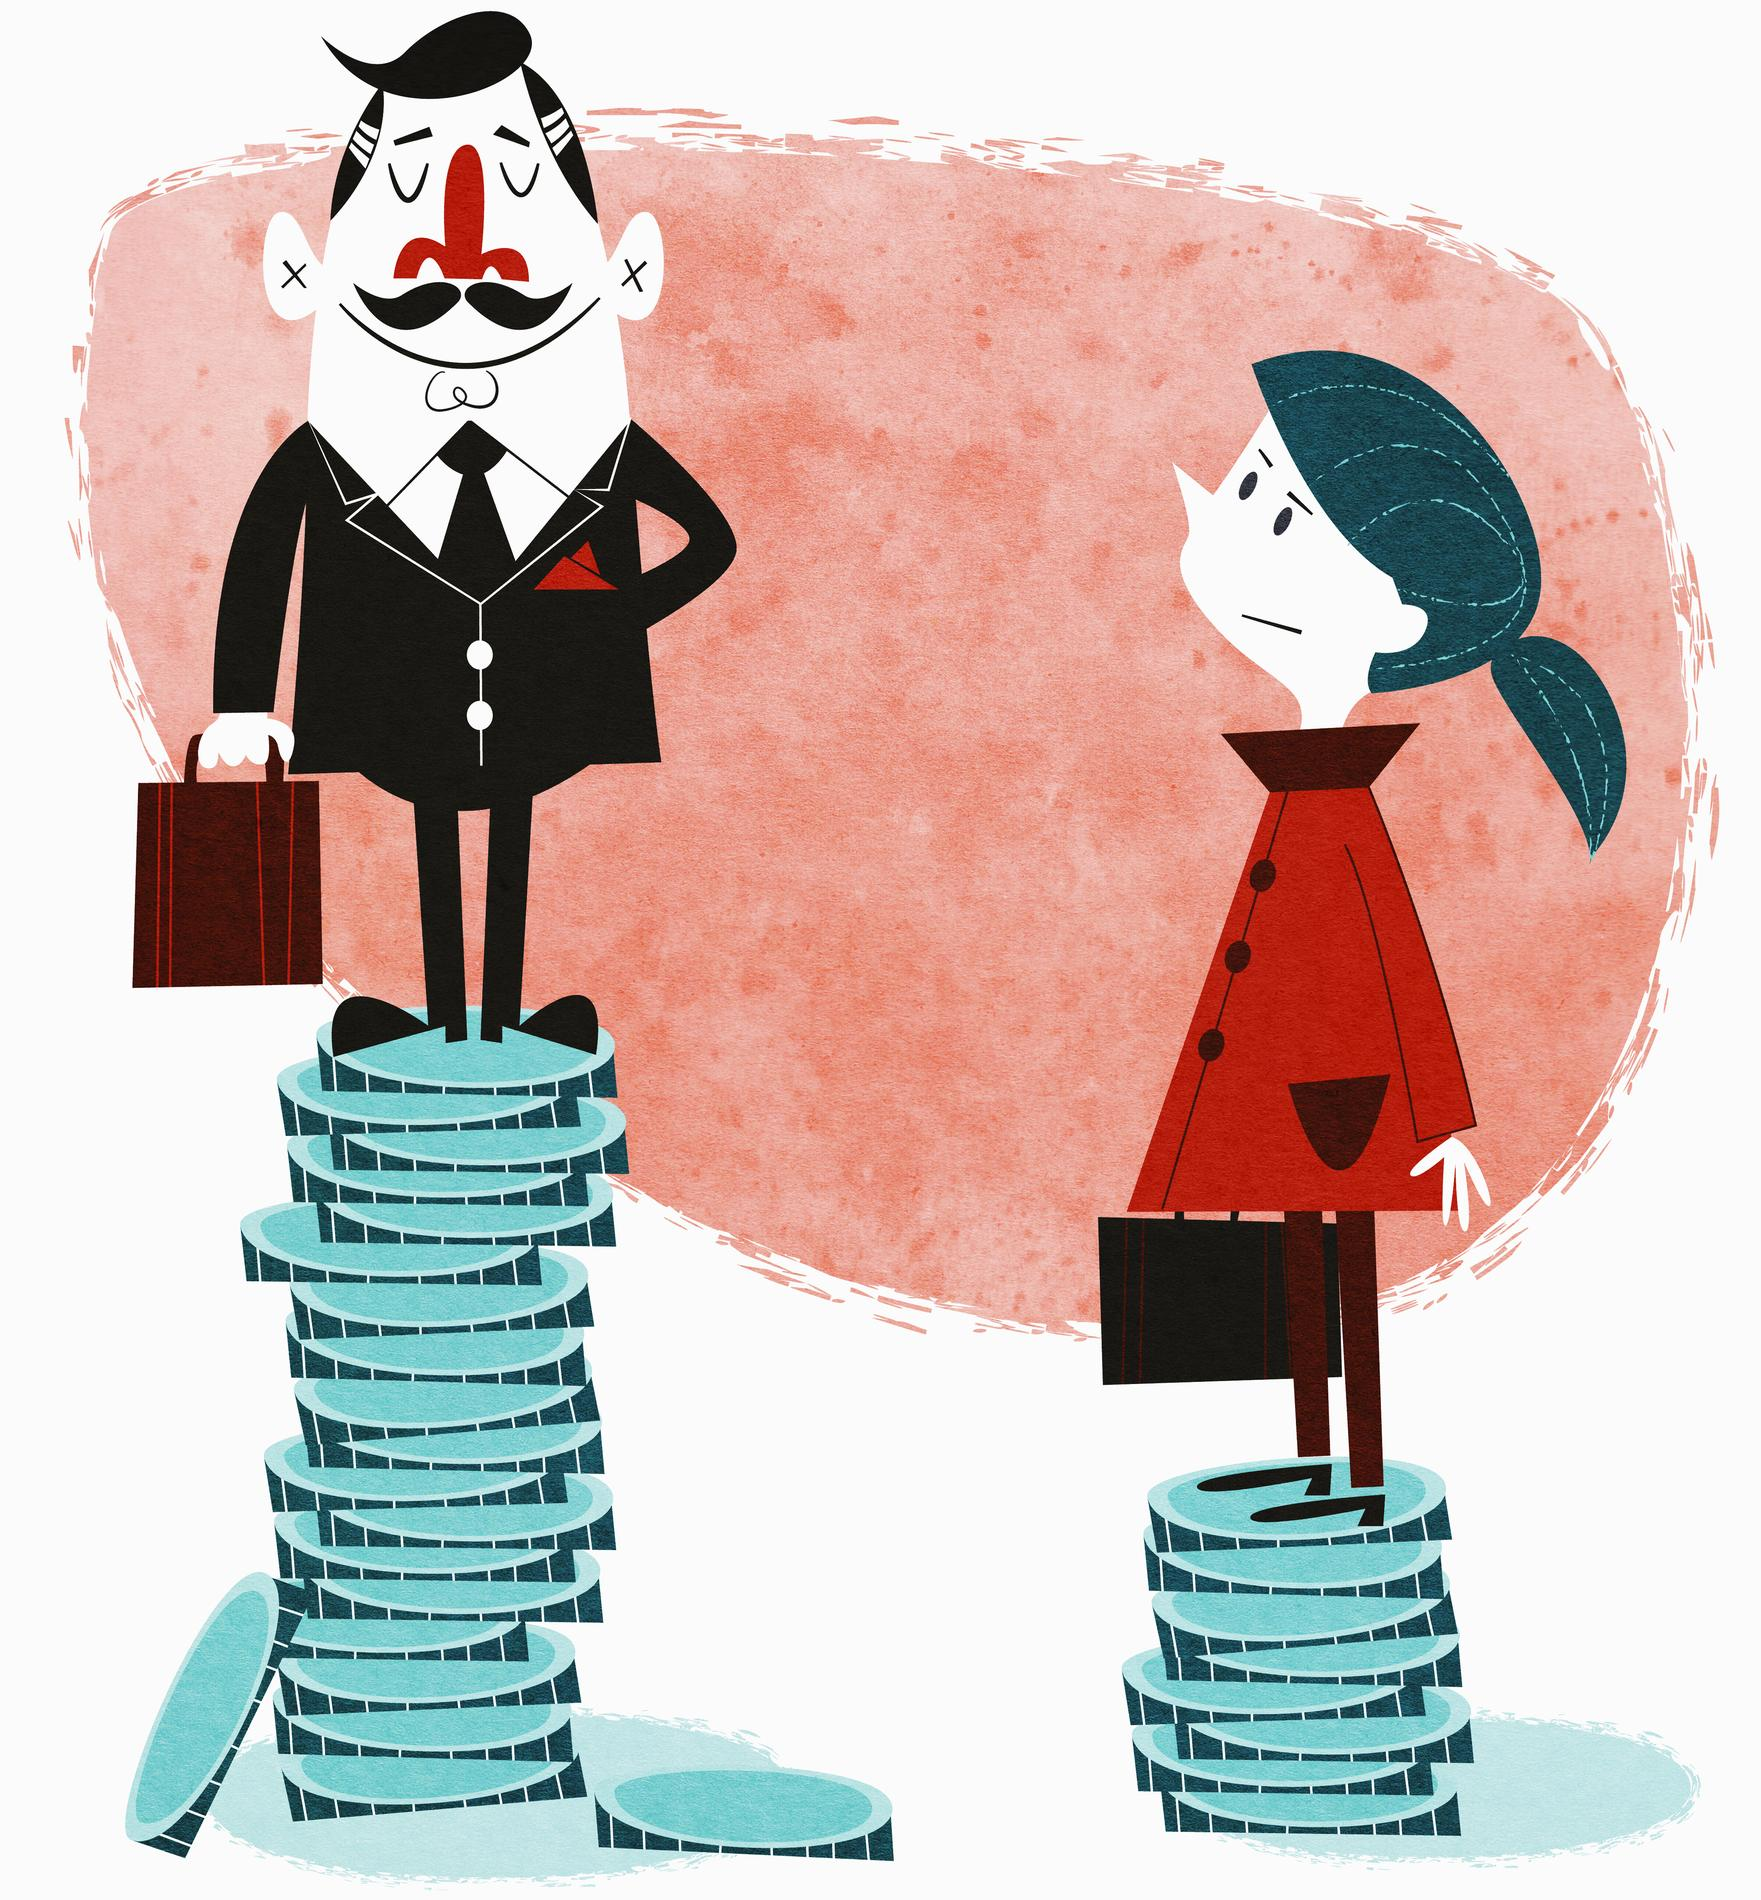 les salaires des hommes baissent ceux des femmes moins madame figaro. Black Bedroom Furniture Sets. Home Design Ideas